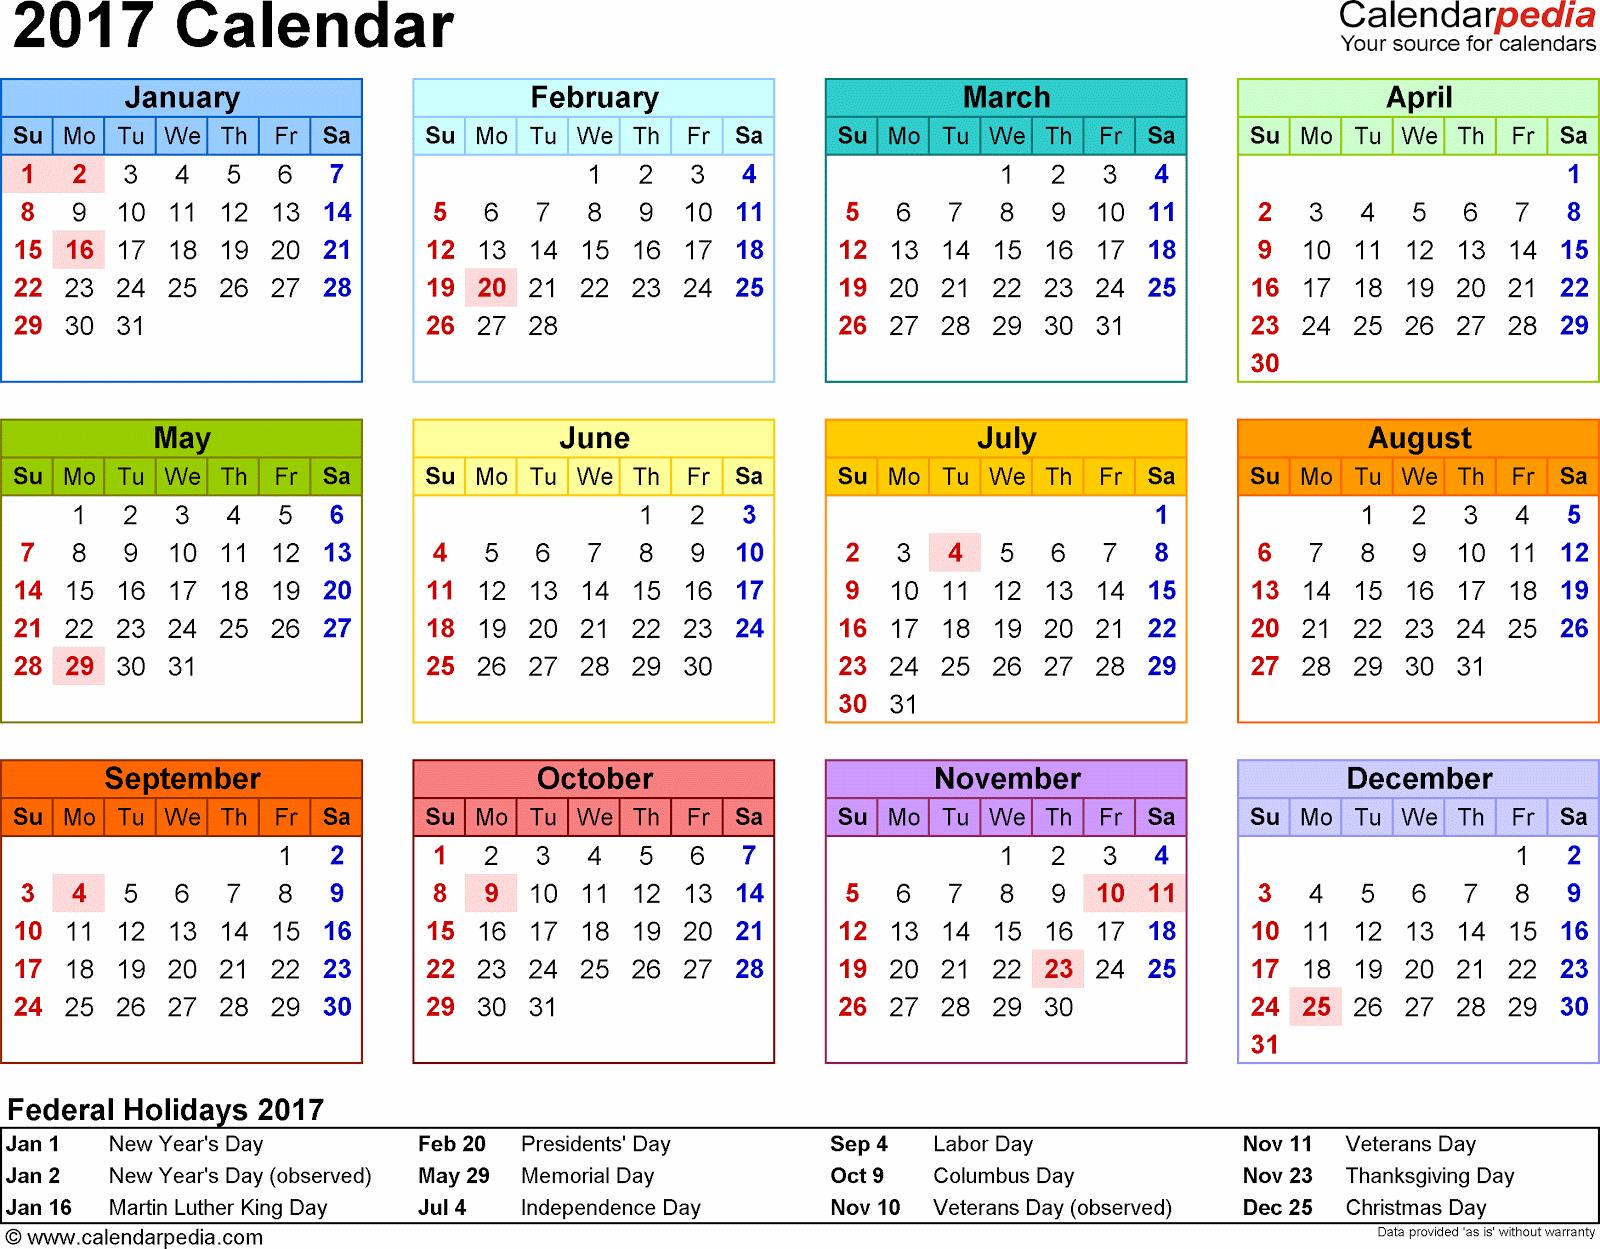 February month calendar clipart jpg freeuse download February 2017 Monthly Calendar Printable Templates - Printable ... jpg freeuse download